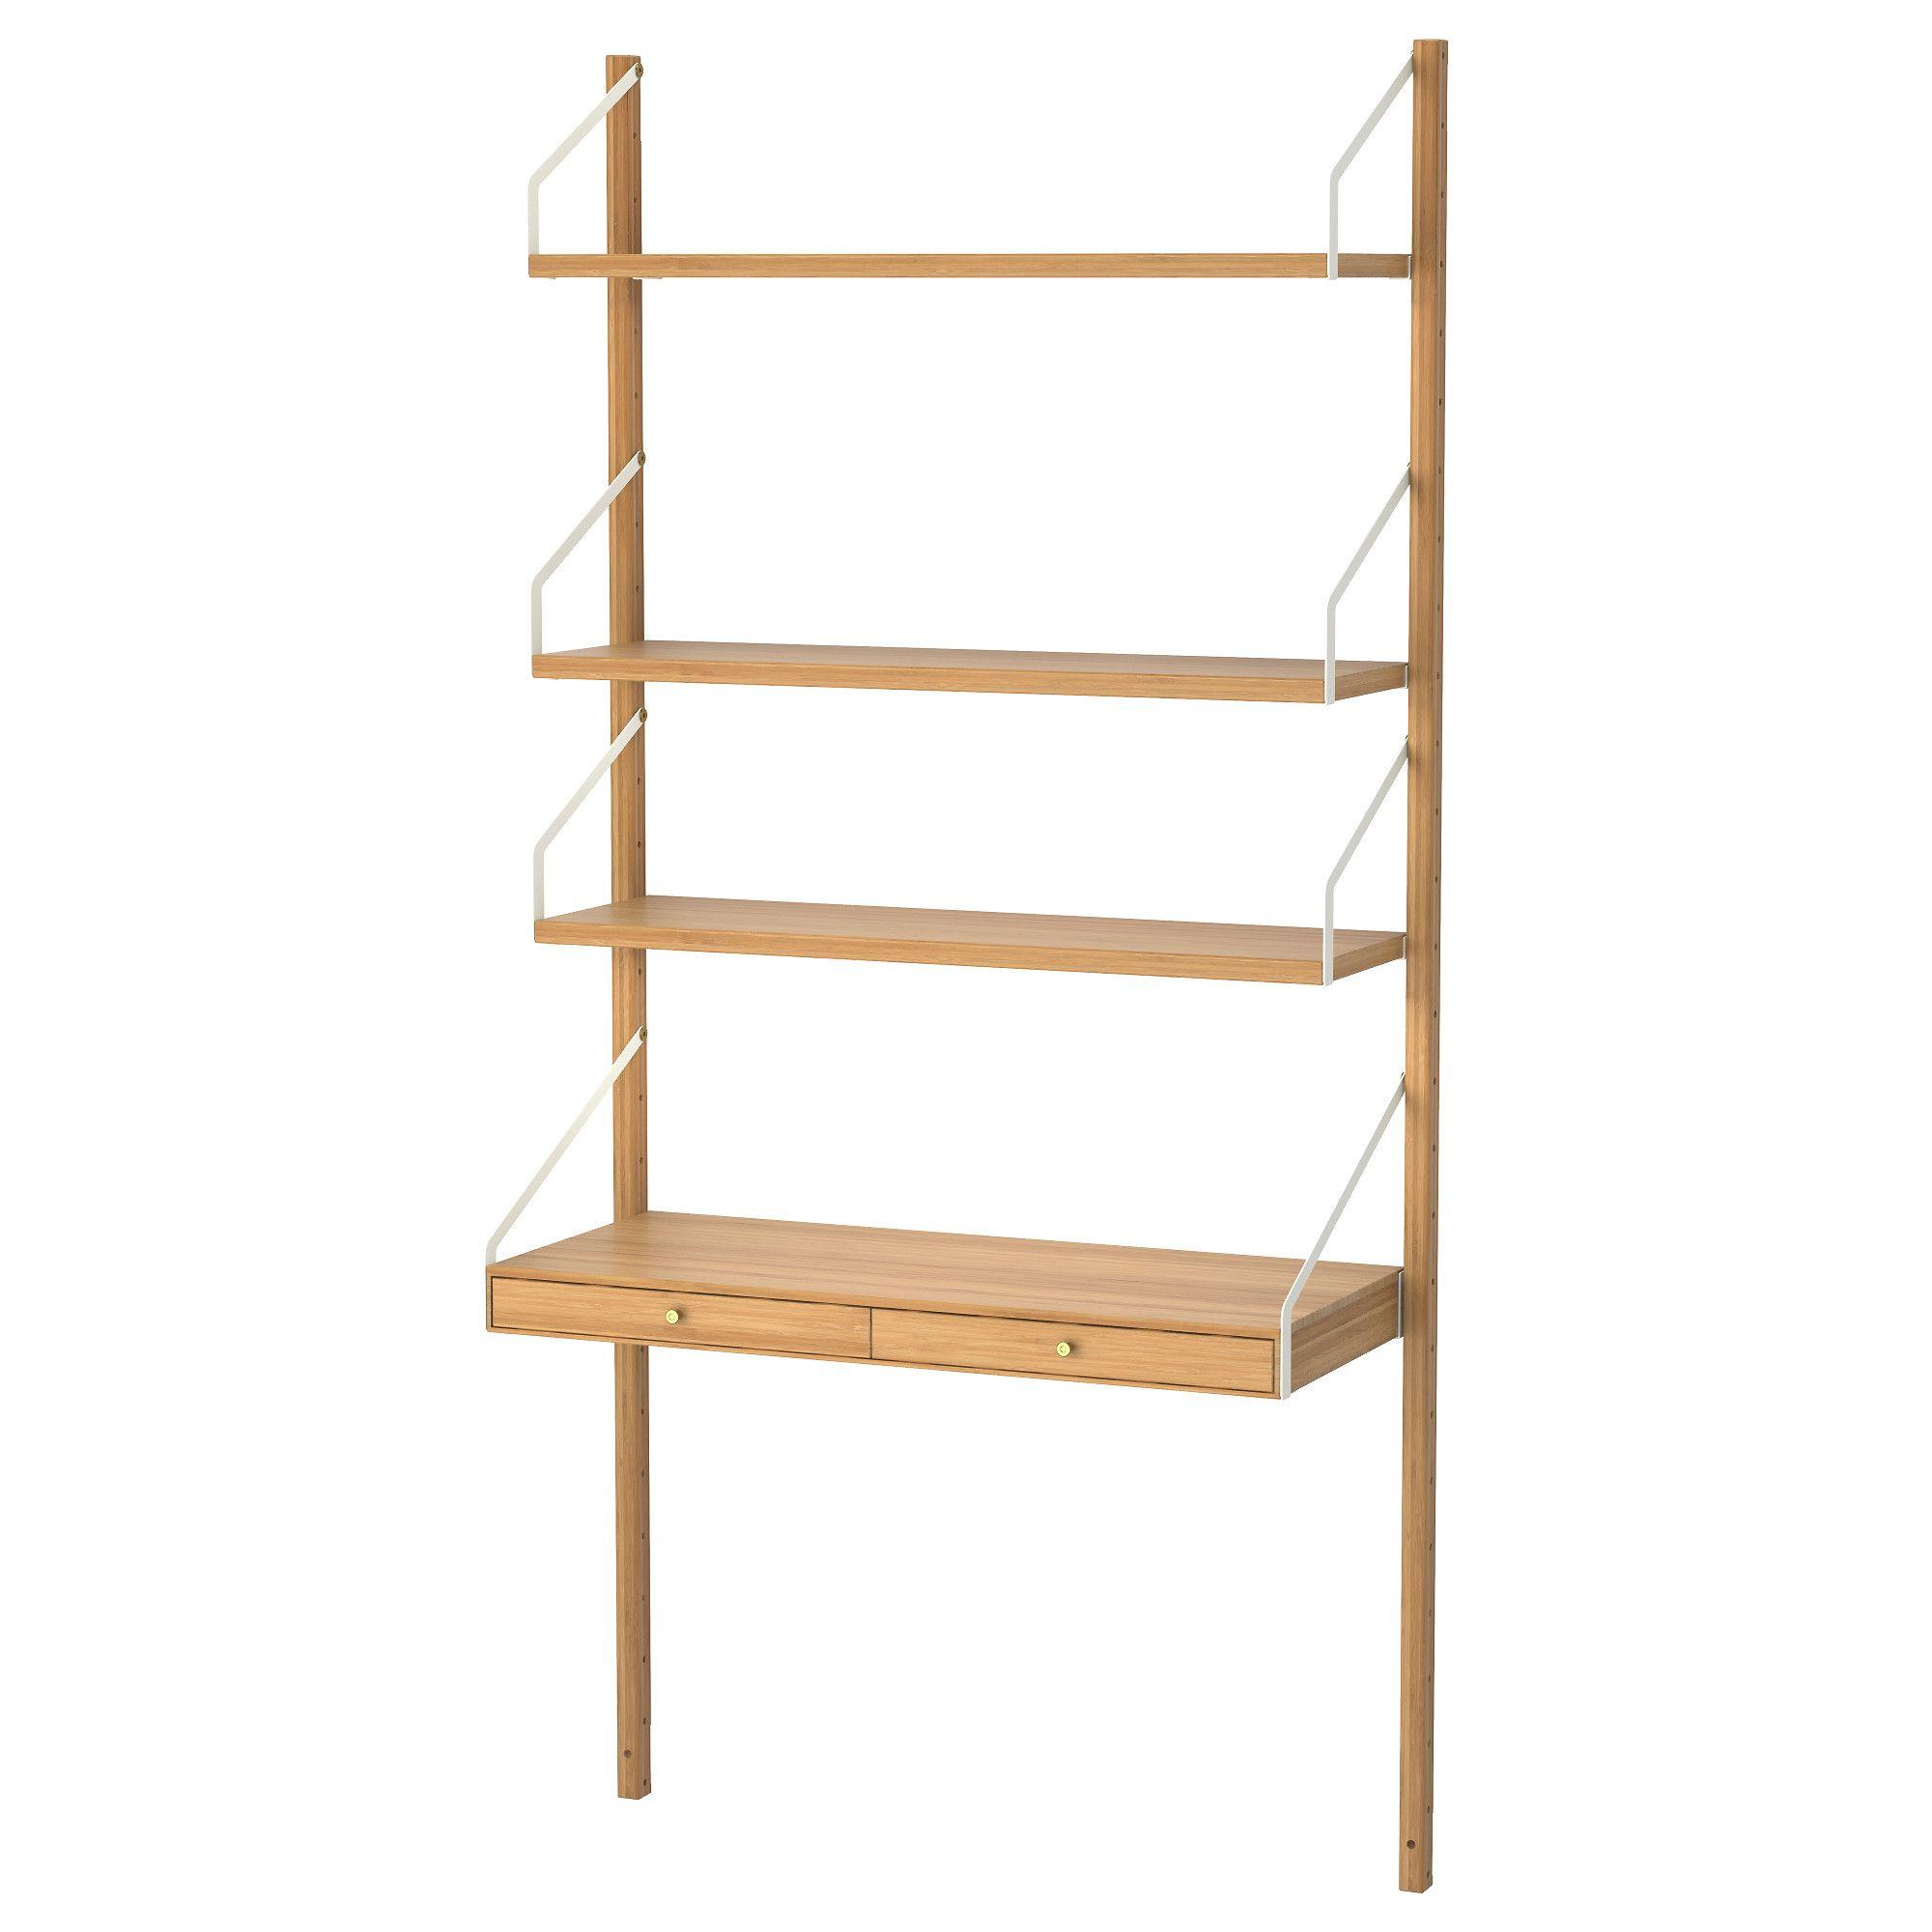 Ikea Svalnas Wall Mounted Storage Combination Bamboo White Wallmounteddesk Zuhause Dekoration Hausmobel Haus Deko